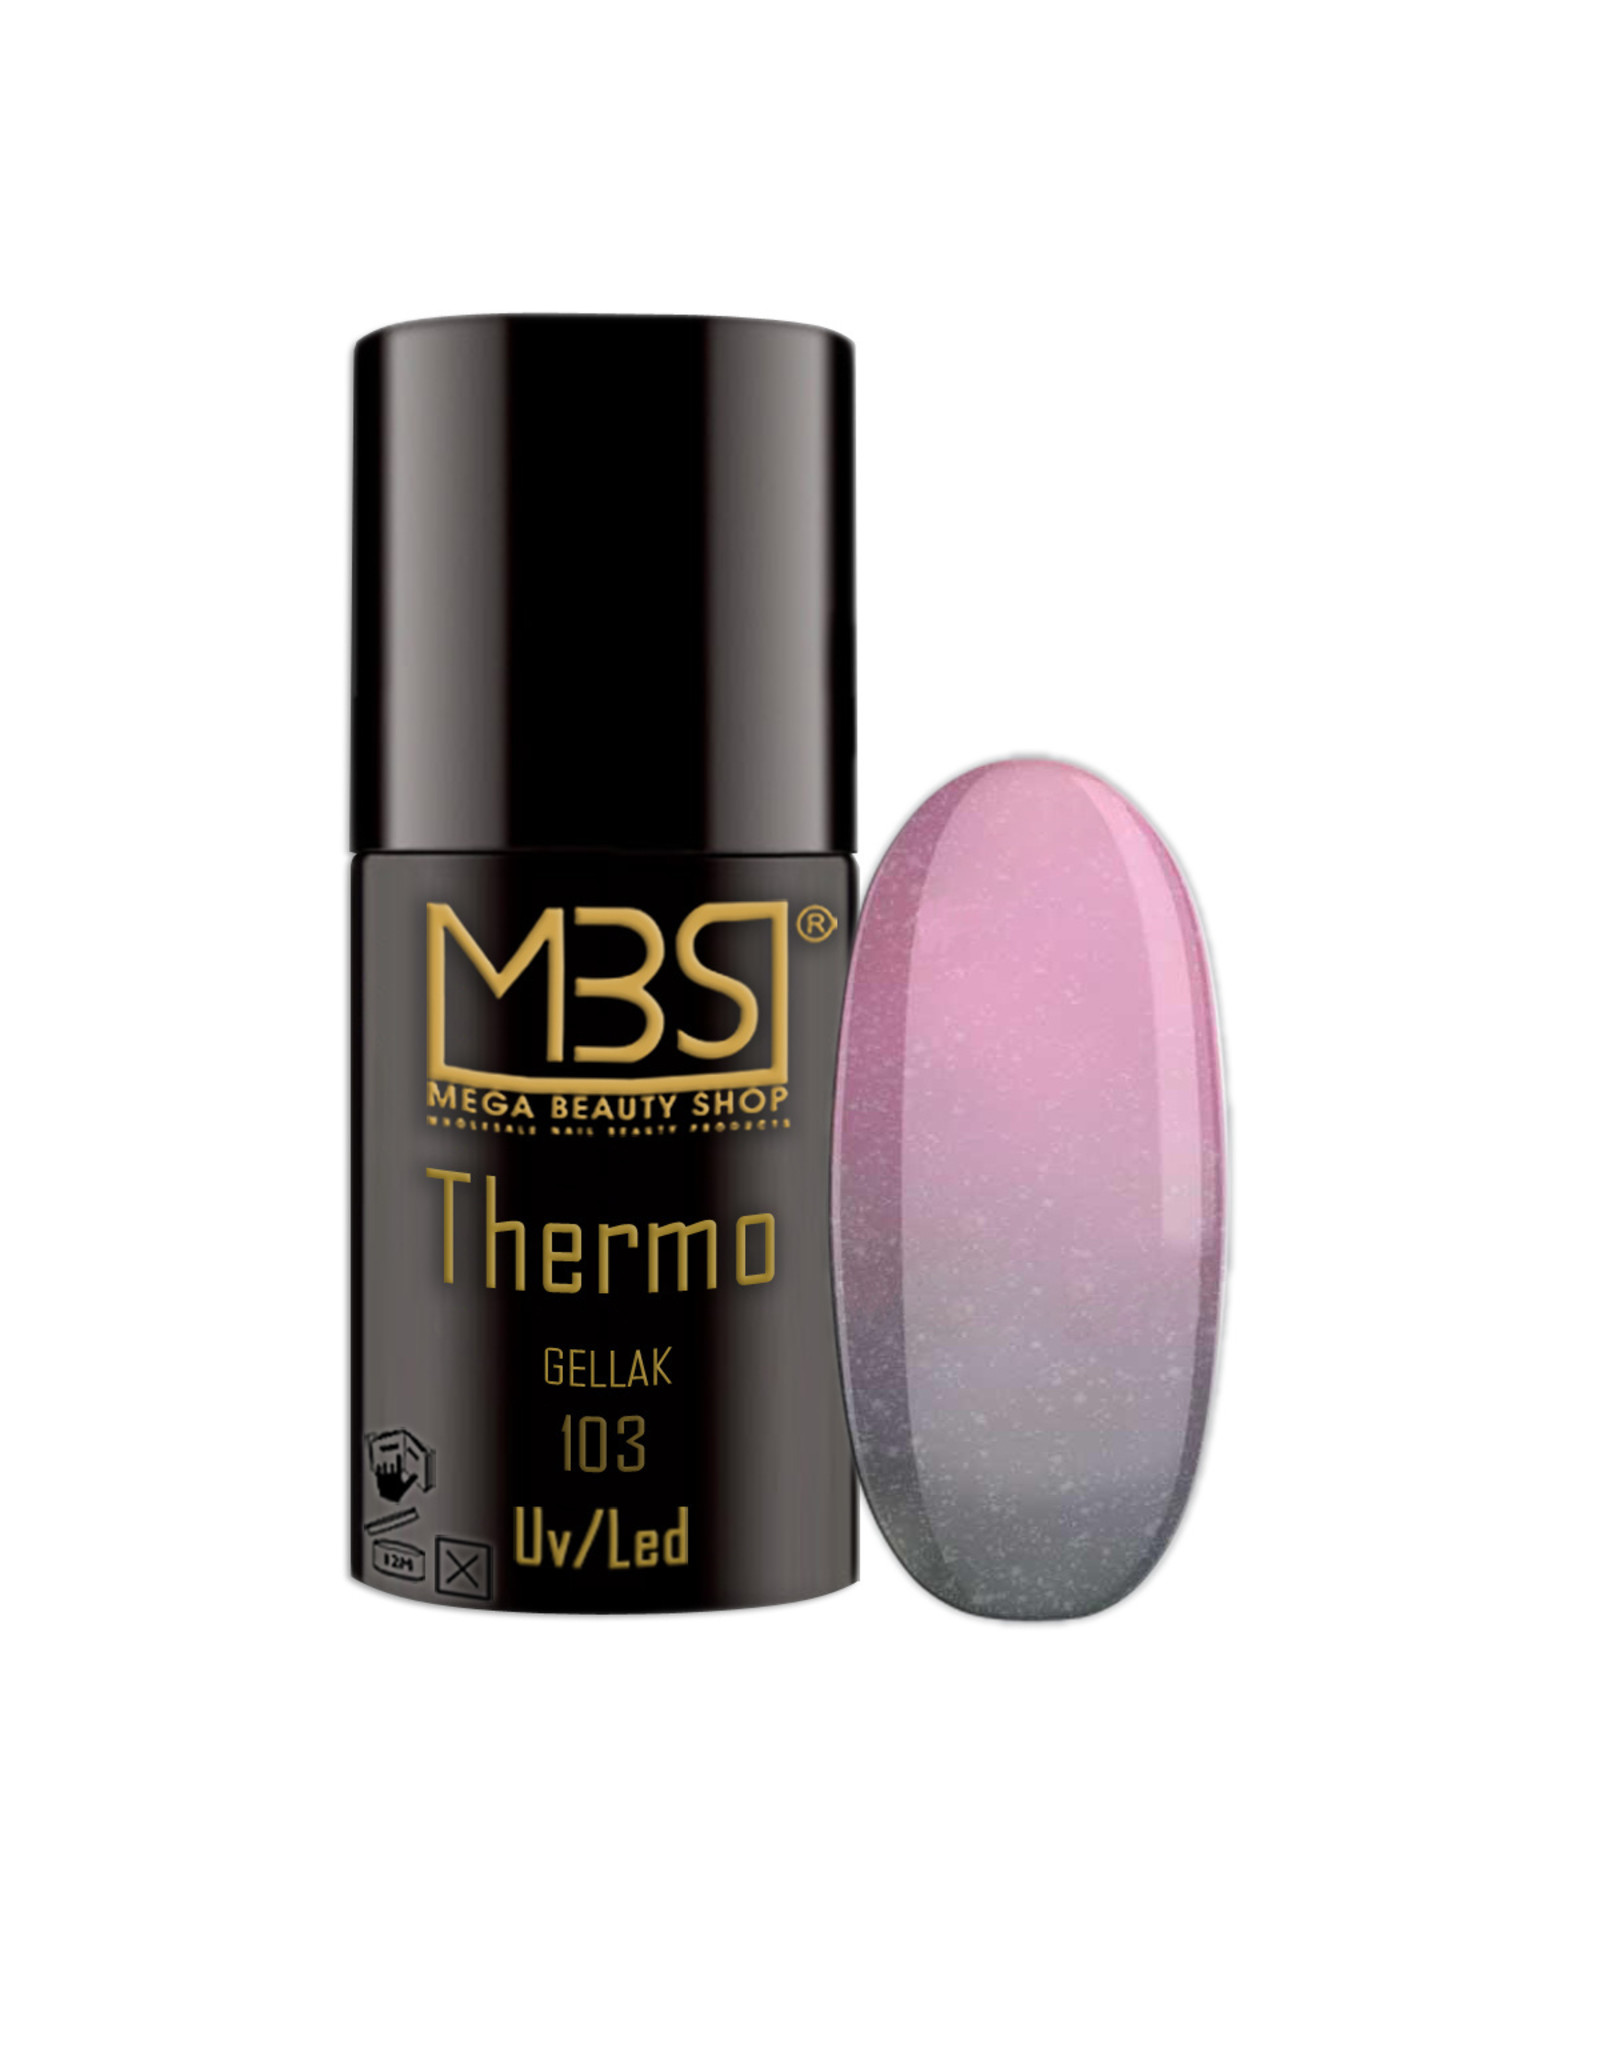 Mega Beauty Shop® Thermo gellak  5ml.   T103